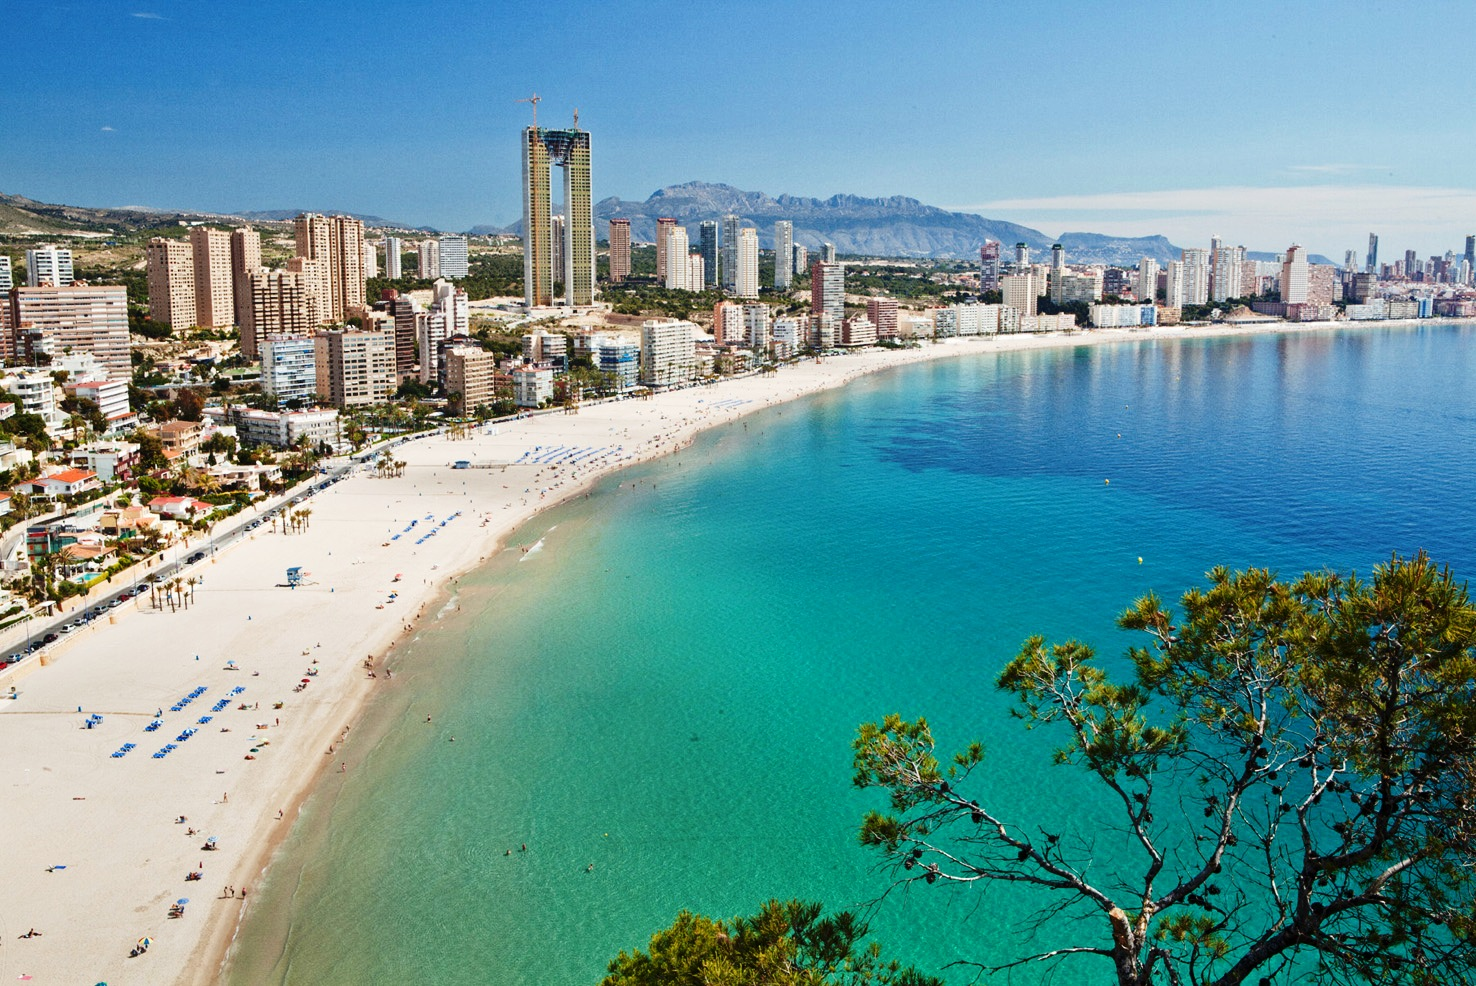 Charter Costa Blanca - Hotel Condal 3*